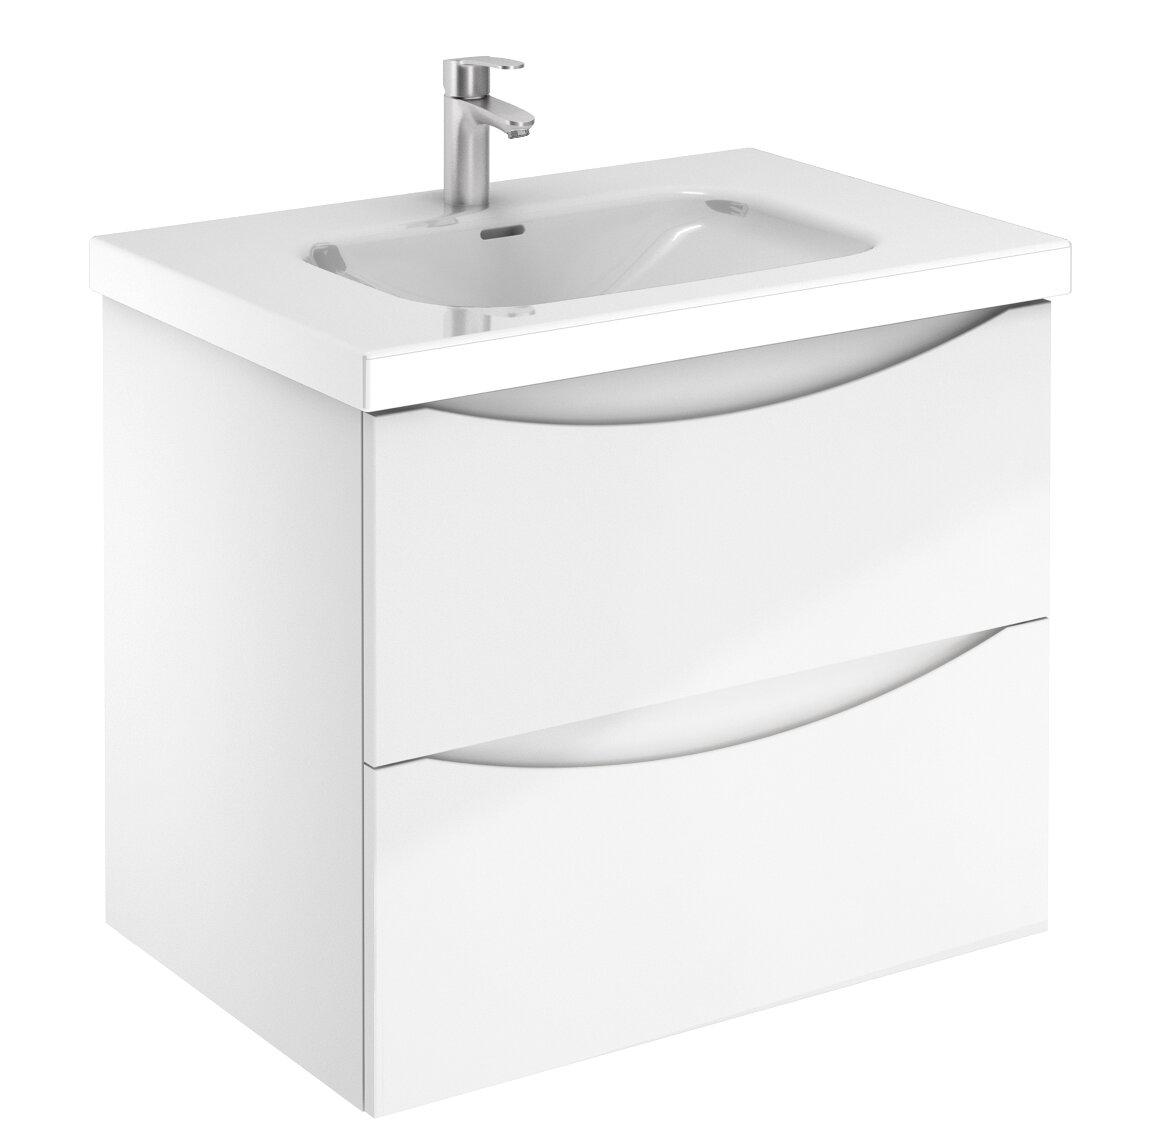 Corrigan Studio Tania 2 Drawer 28 Wall Mounted Single Bathroom Vanity Set Wayfair